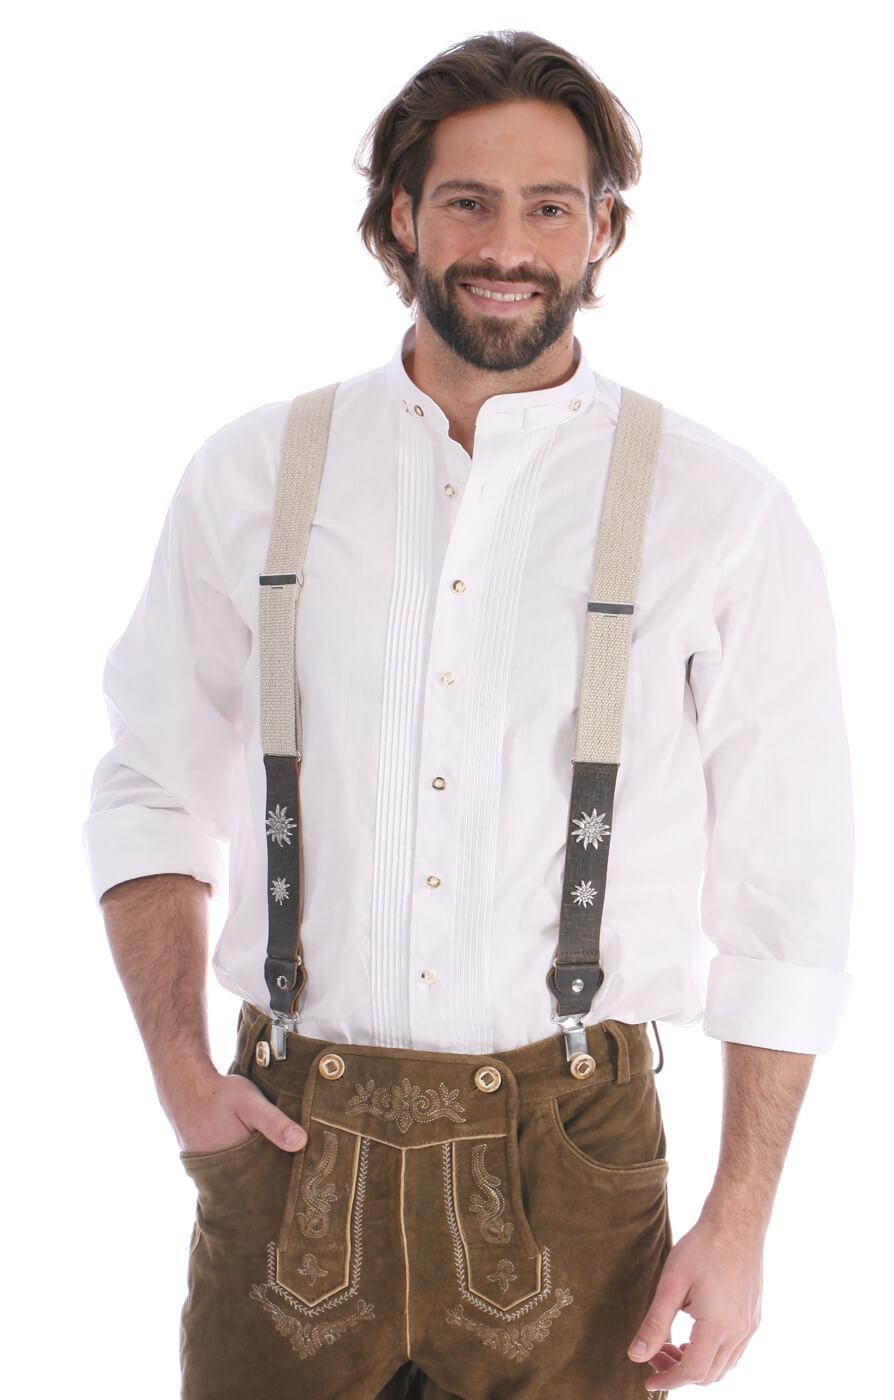 Trachtenhemd-Pfoad-Stehkragen-Almsach-BARDO-weiss56be035aaf4125790c0f8eddfb